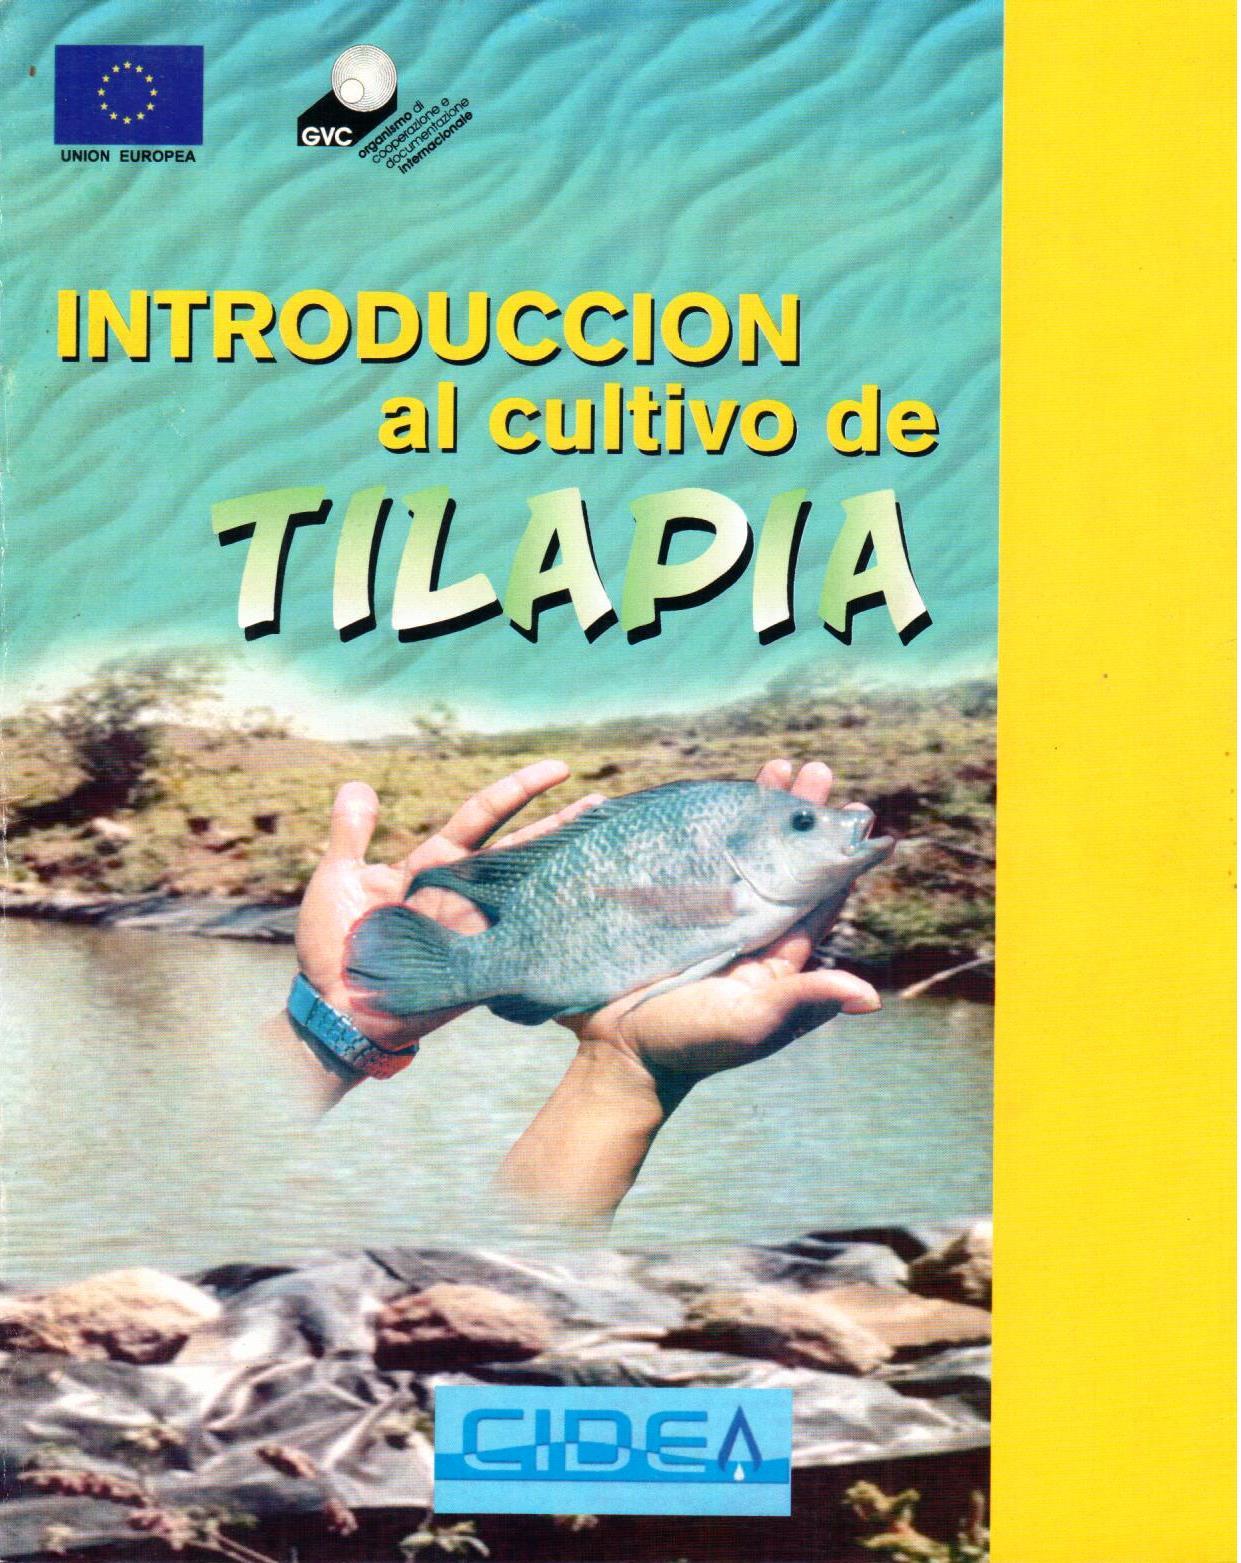 Peces y pesca en nicaragua publicaciones for Manual de piscicultura tilapia